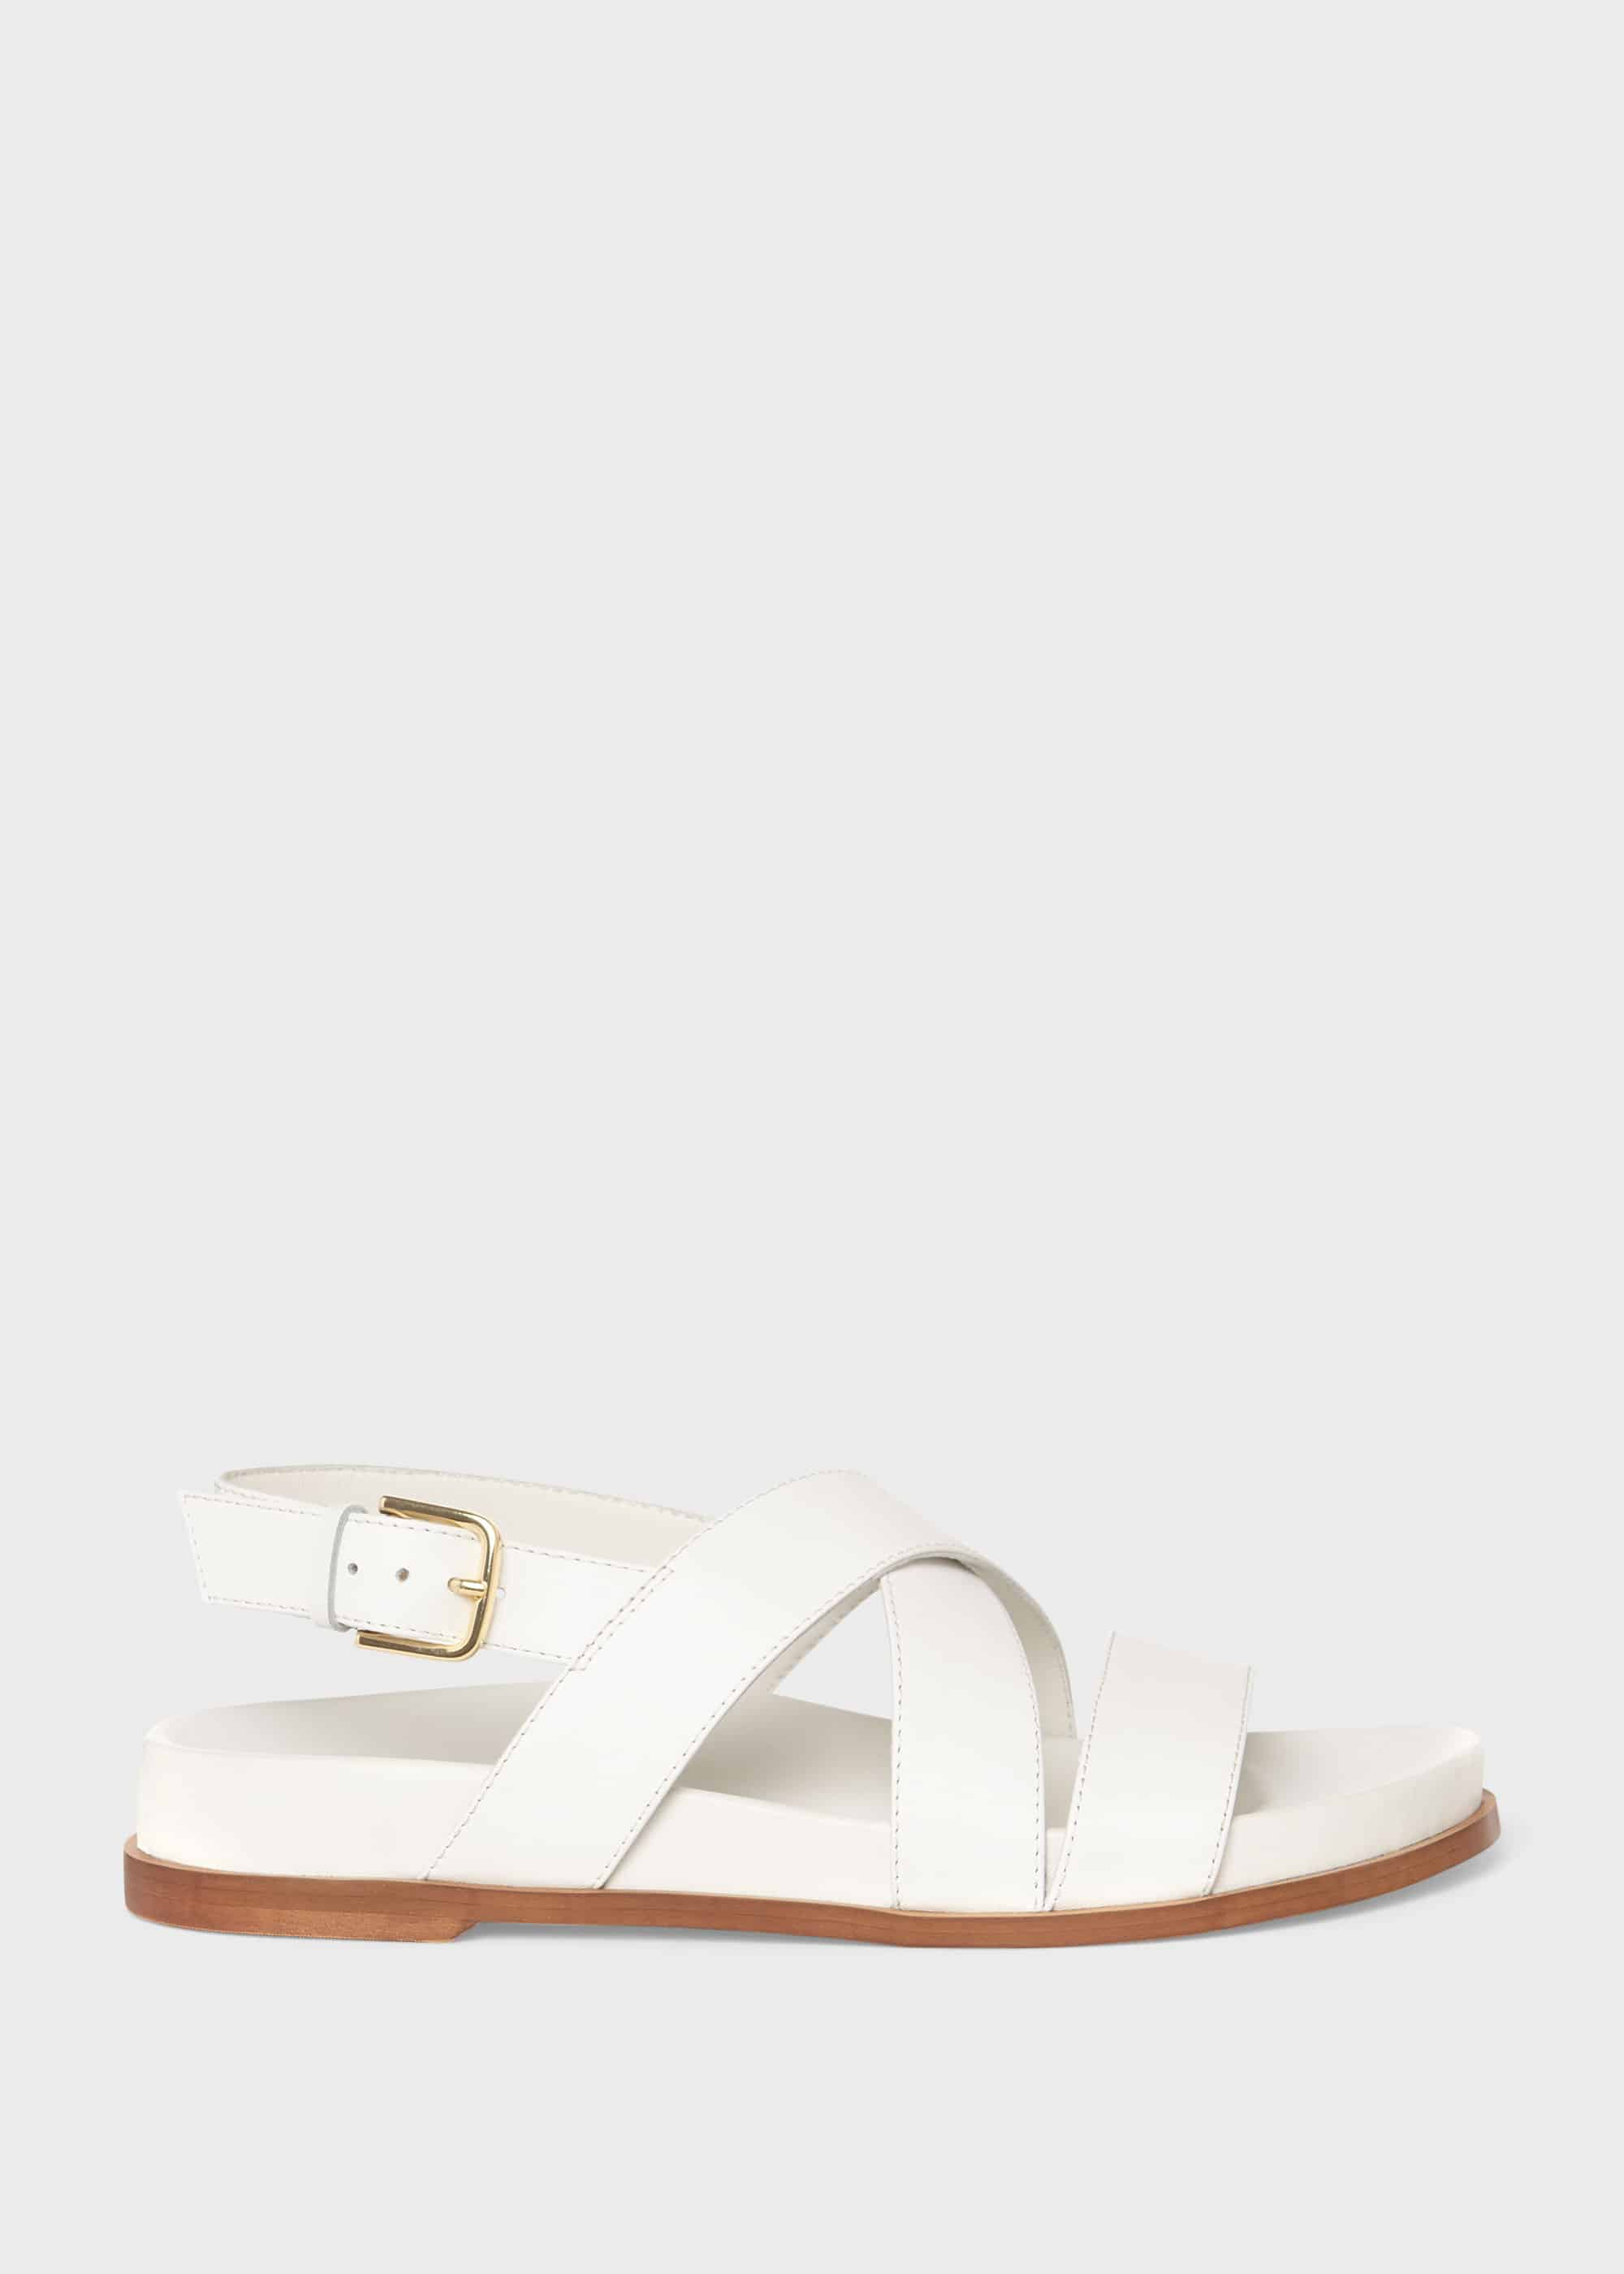 Hobbs Women Clementine Leather Sandal